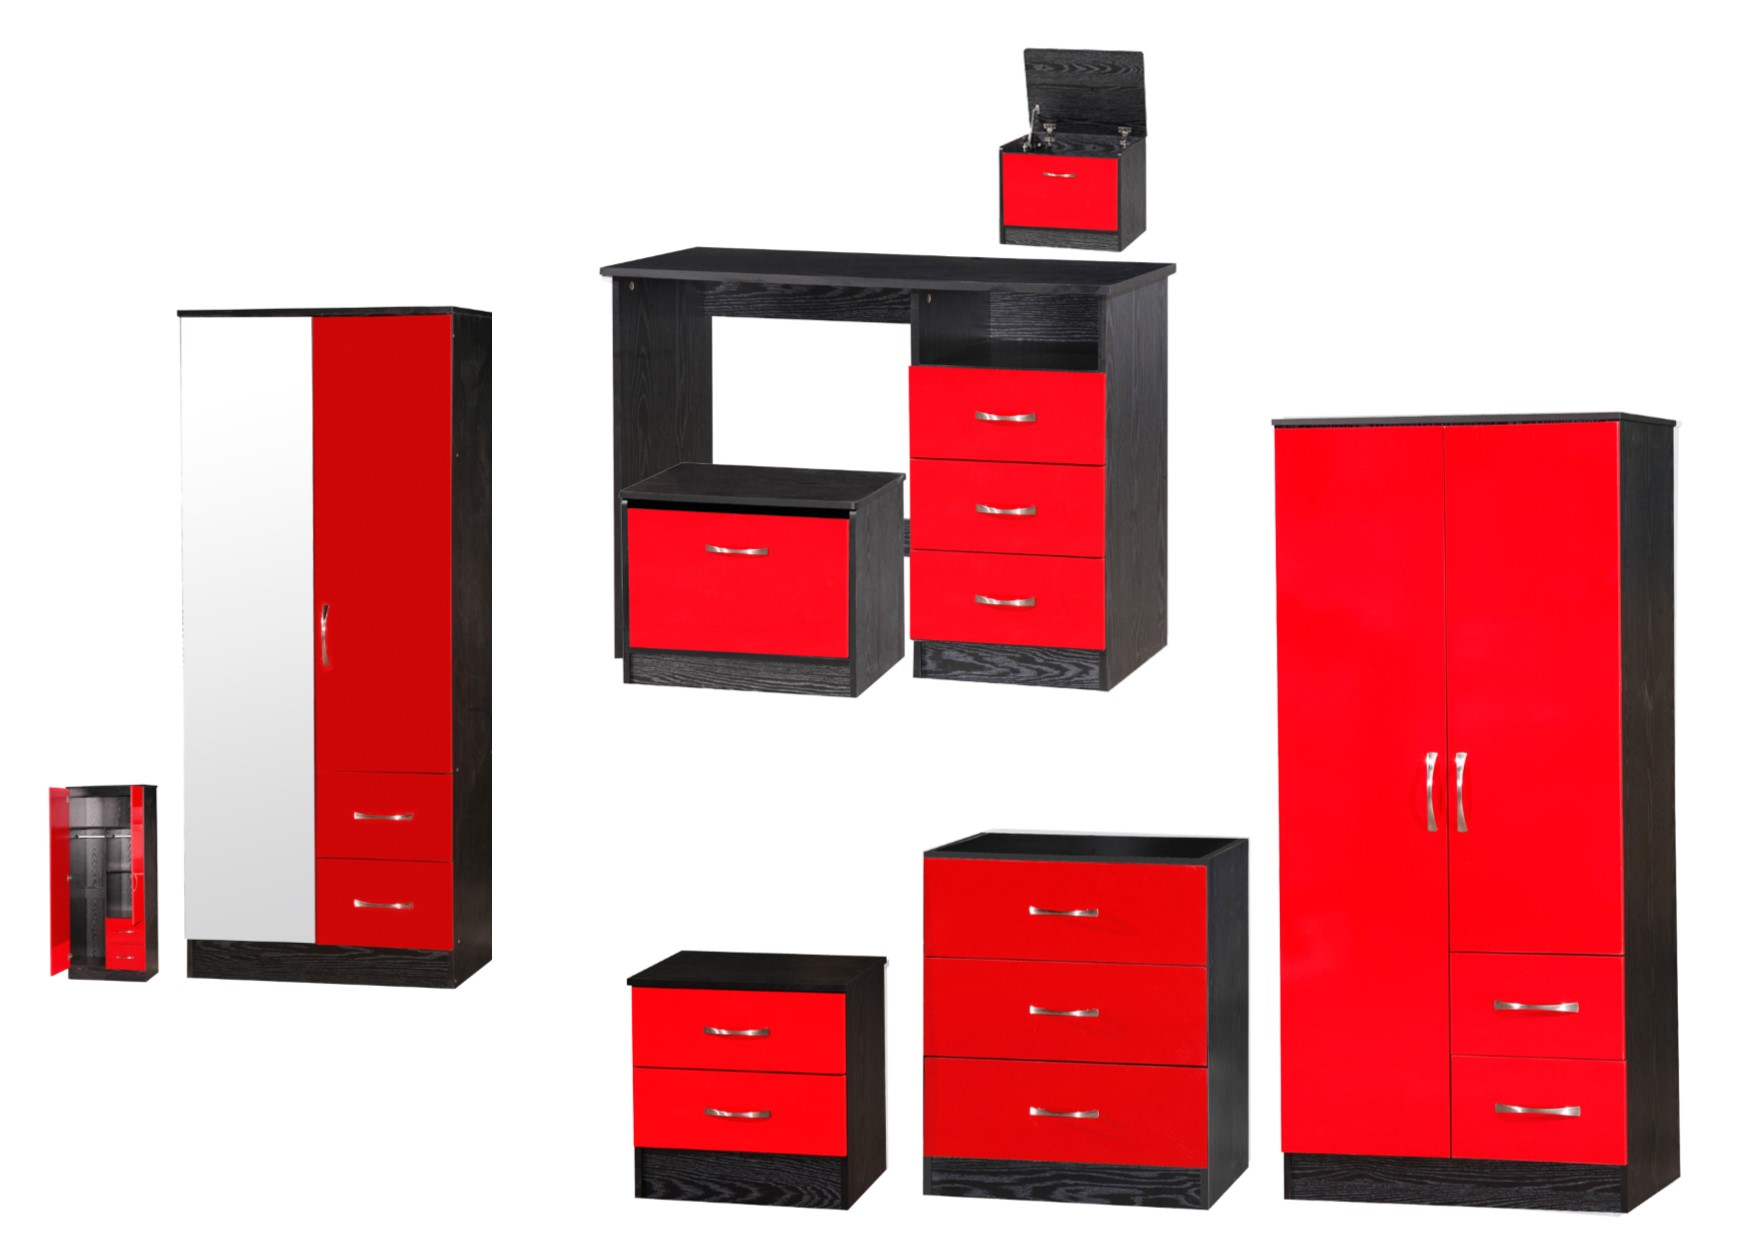 red high gloss furniture. Marina Red \u0026 Black High Gloss Bedroom Furniture - Sets Wardrobe Drawers Bedside